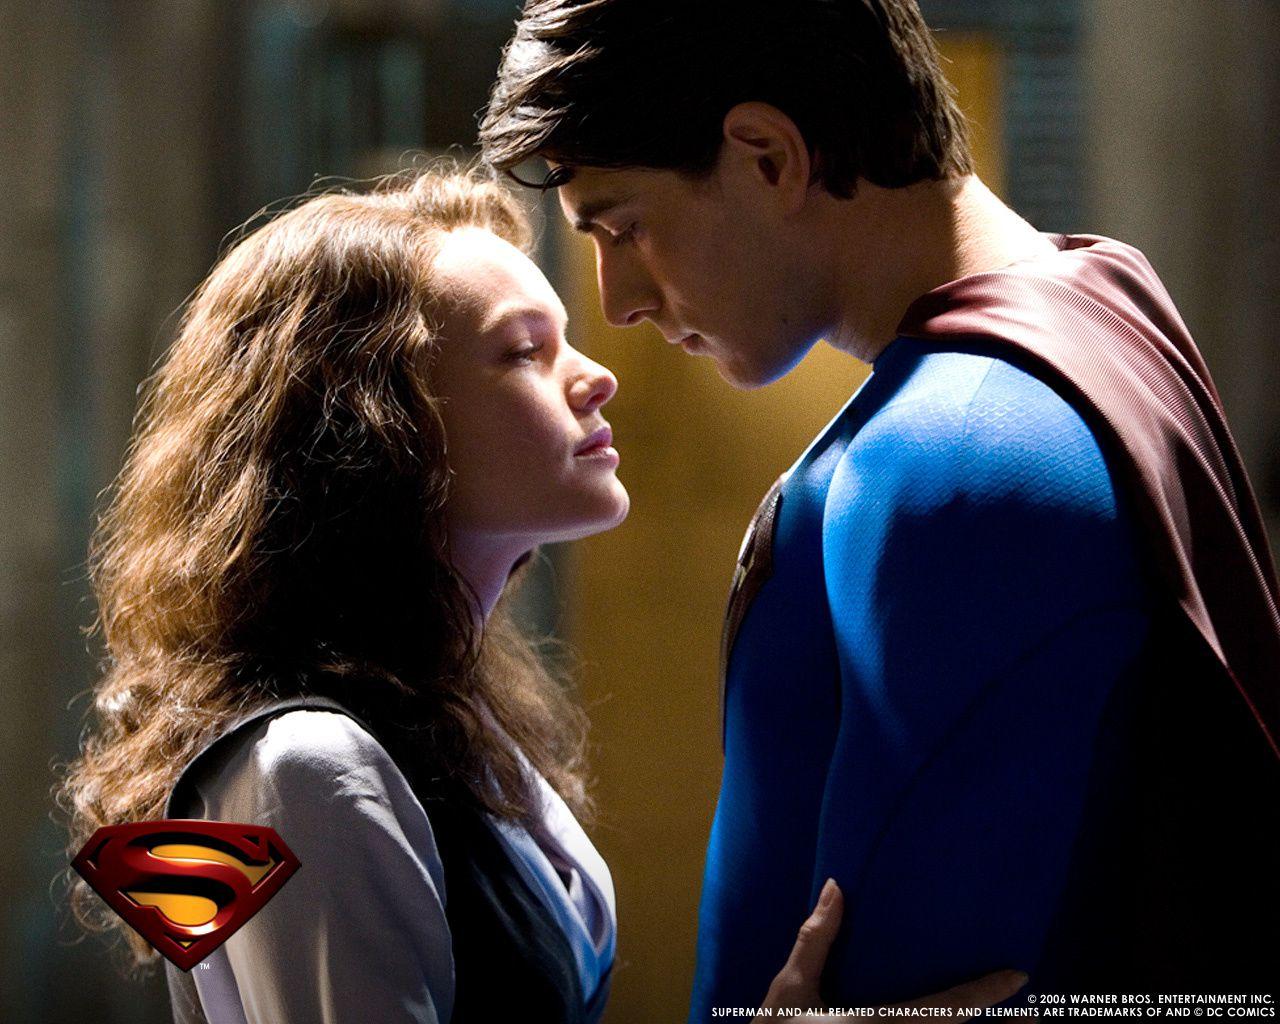 Superman returns (2005) Bryan Singer